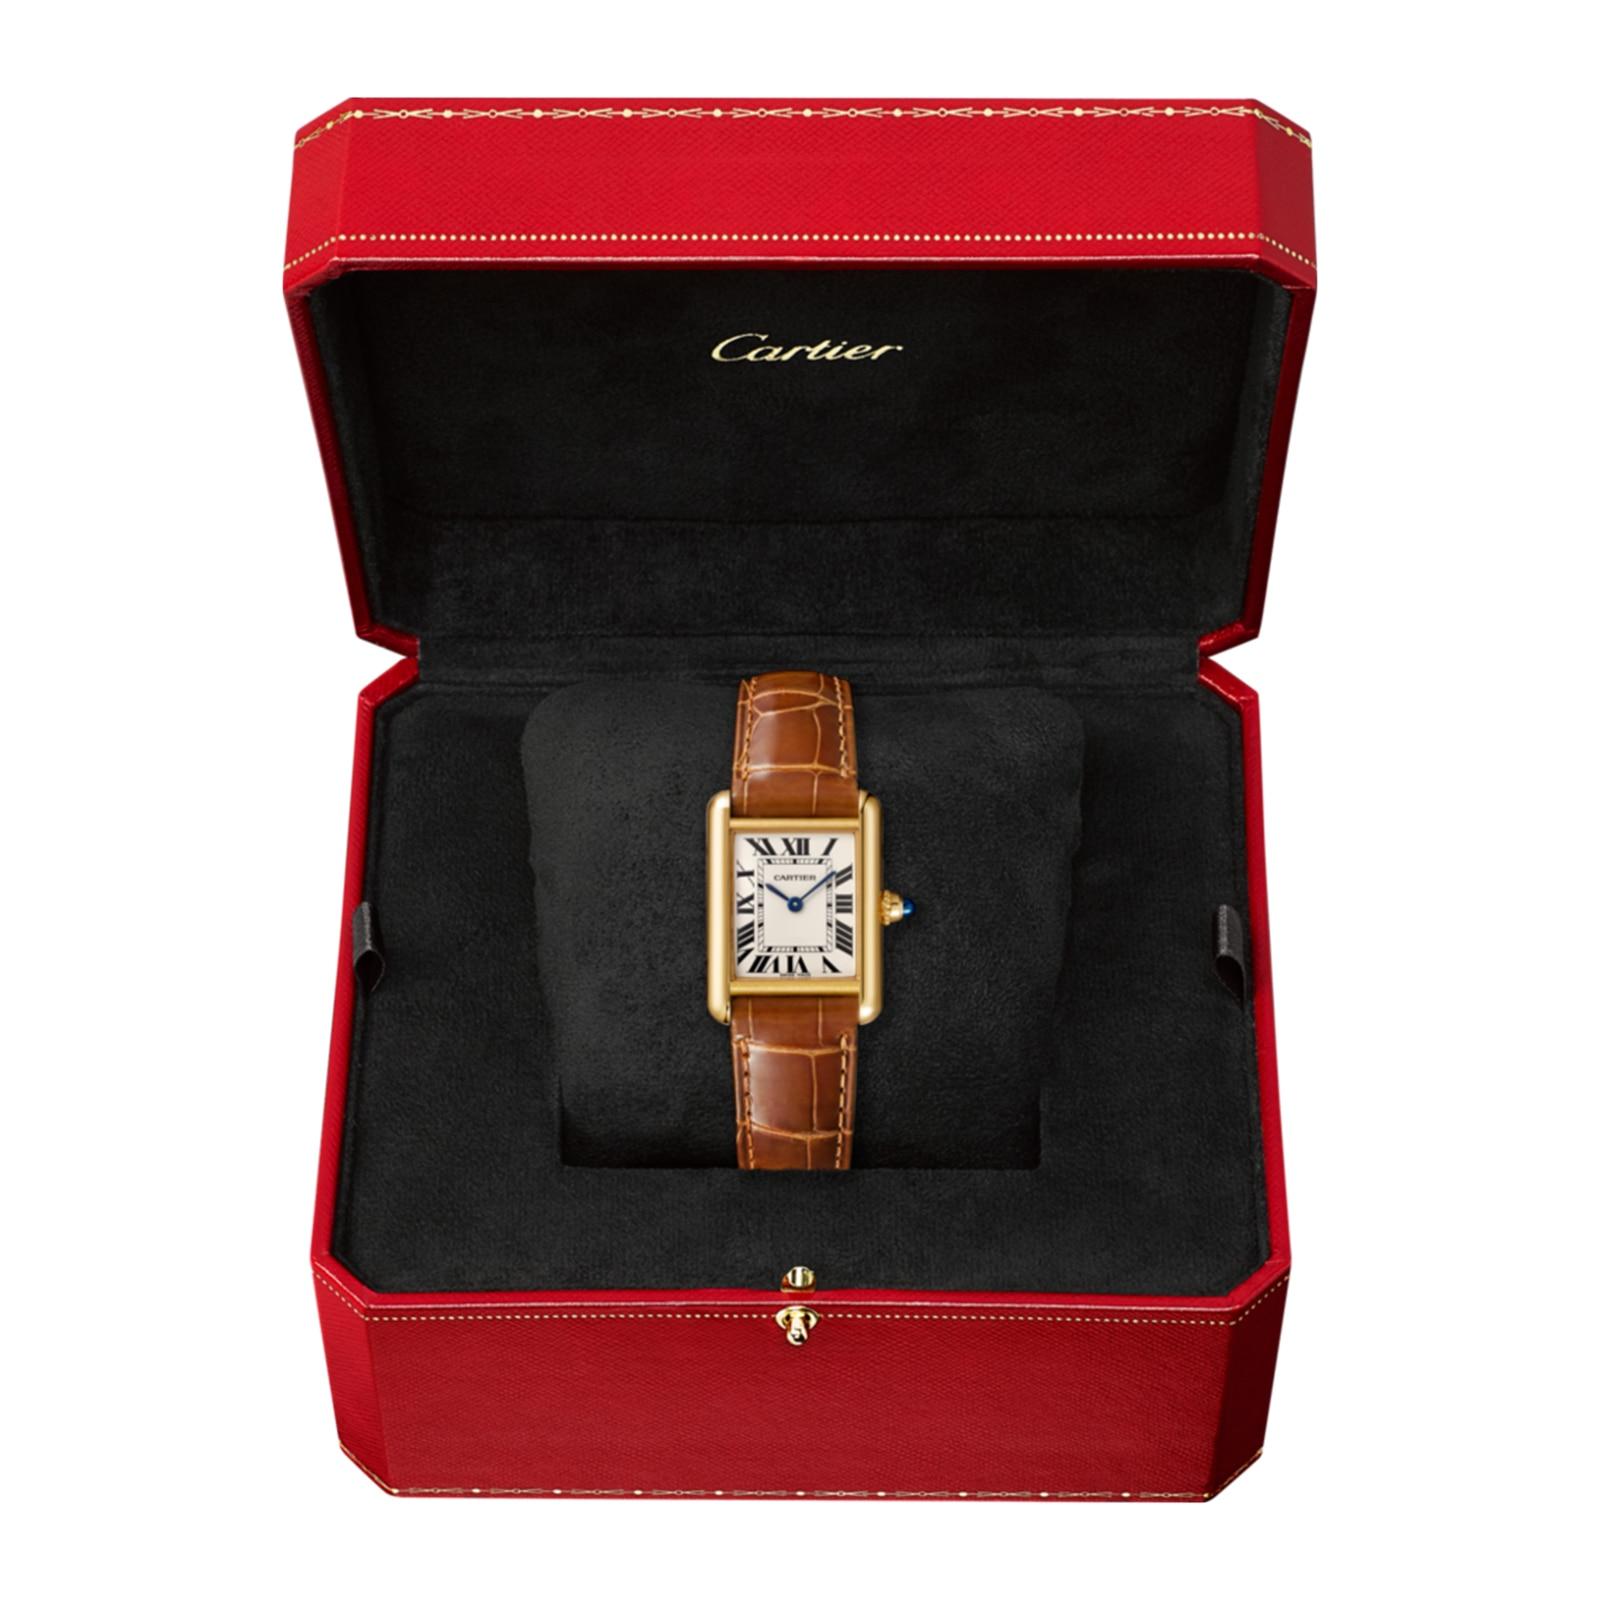 Cartier Tank Louis Cartier watch, Small model, 18K yellow gold, leather, sapphire